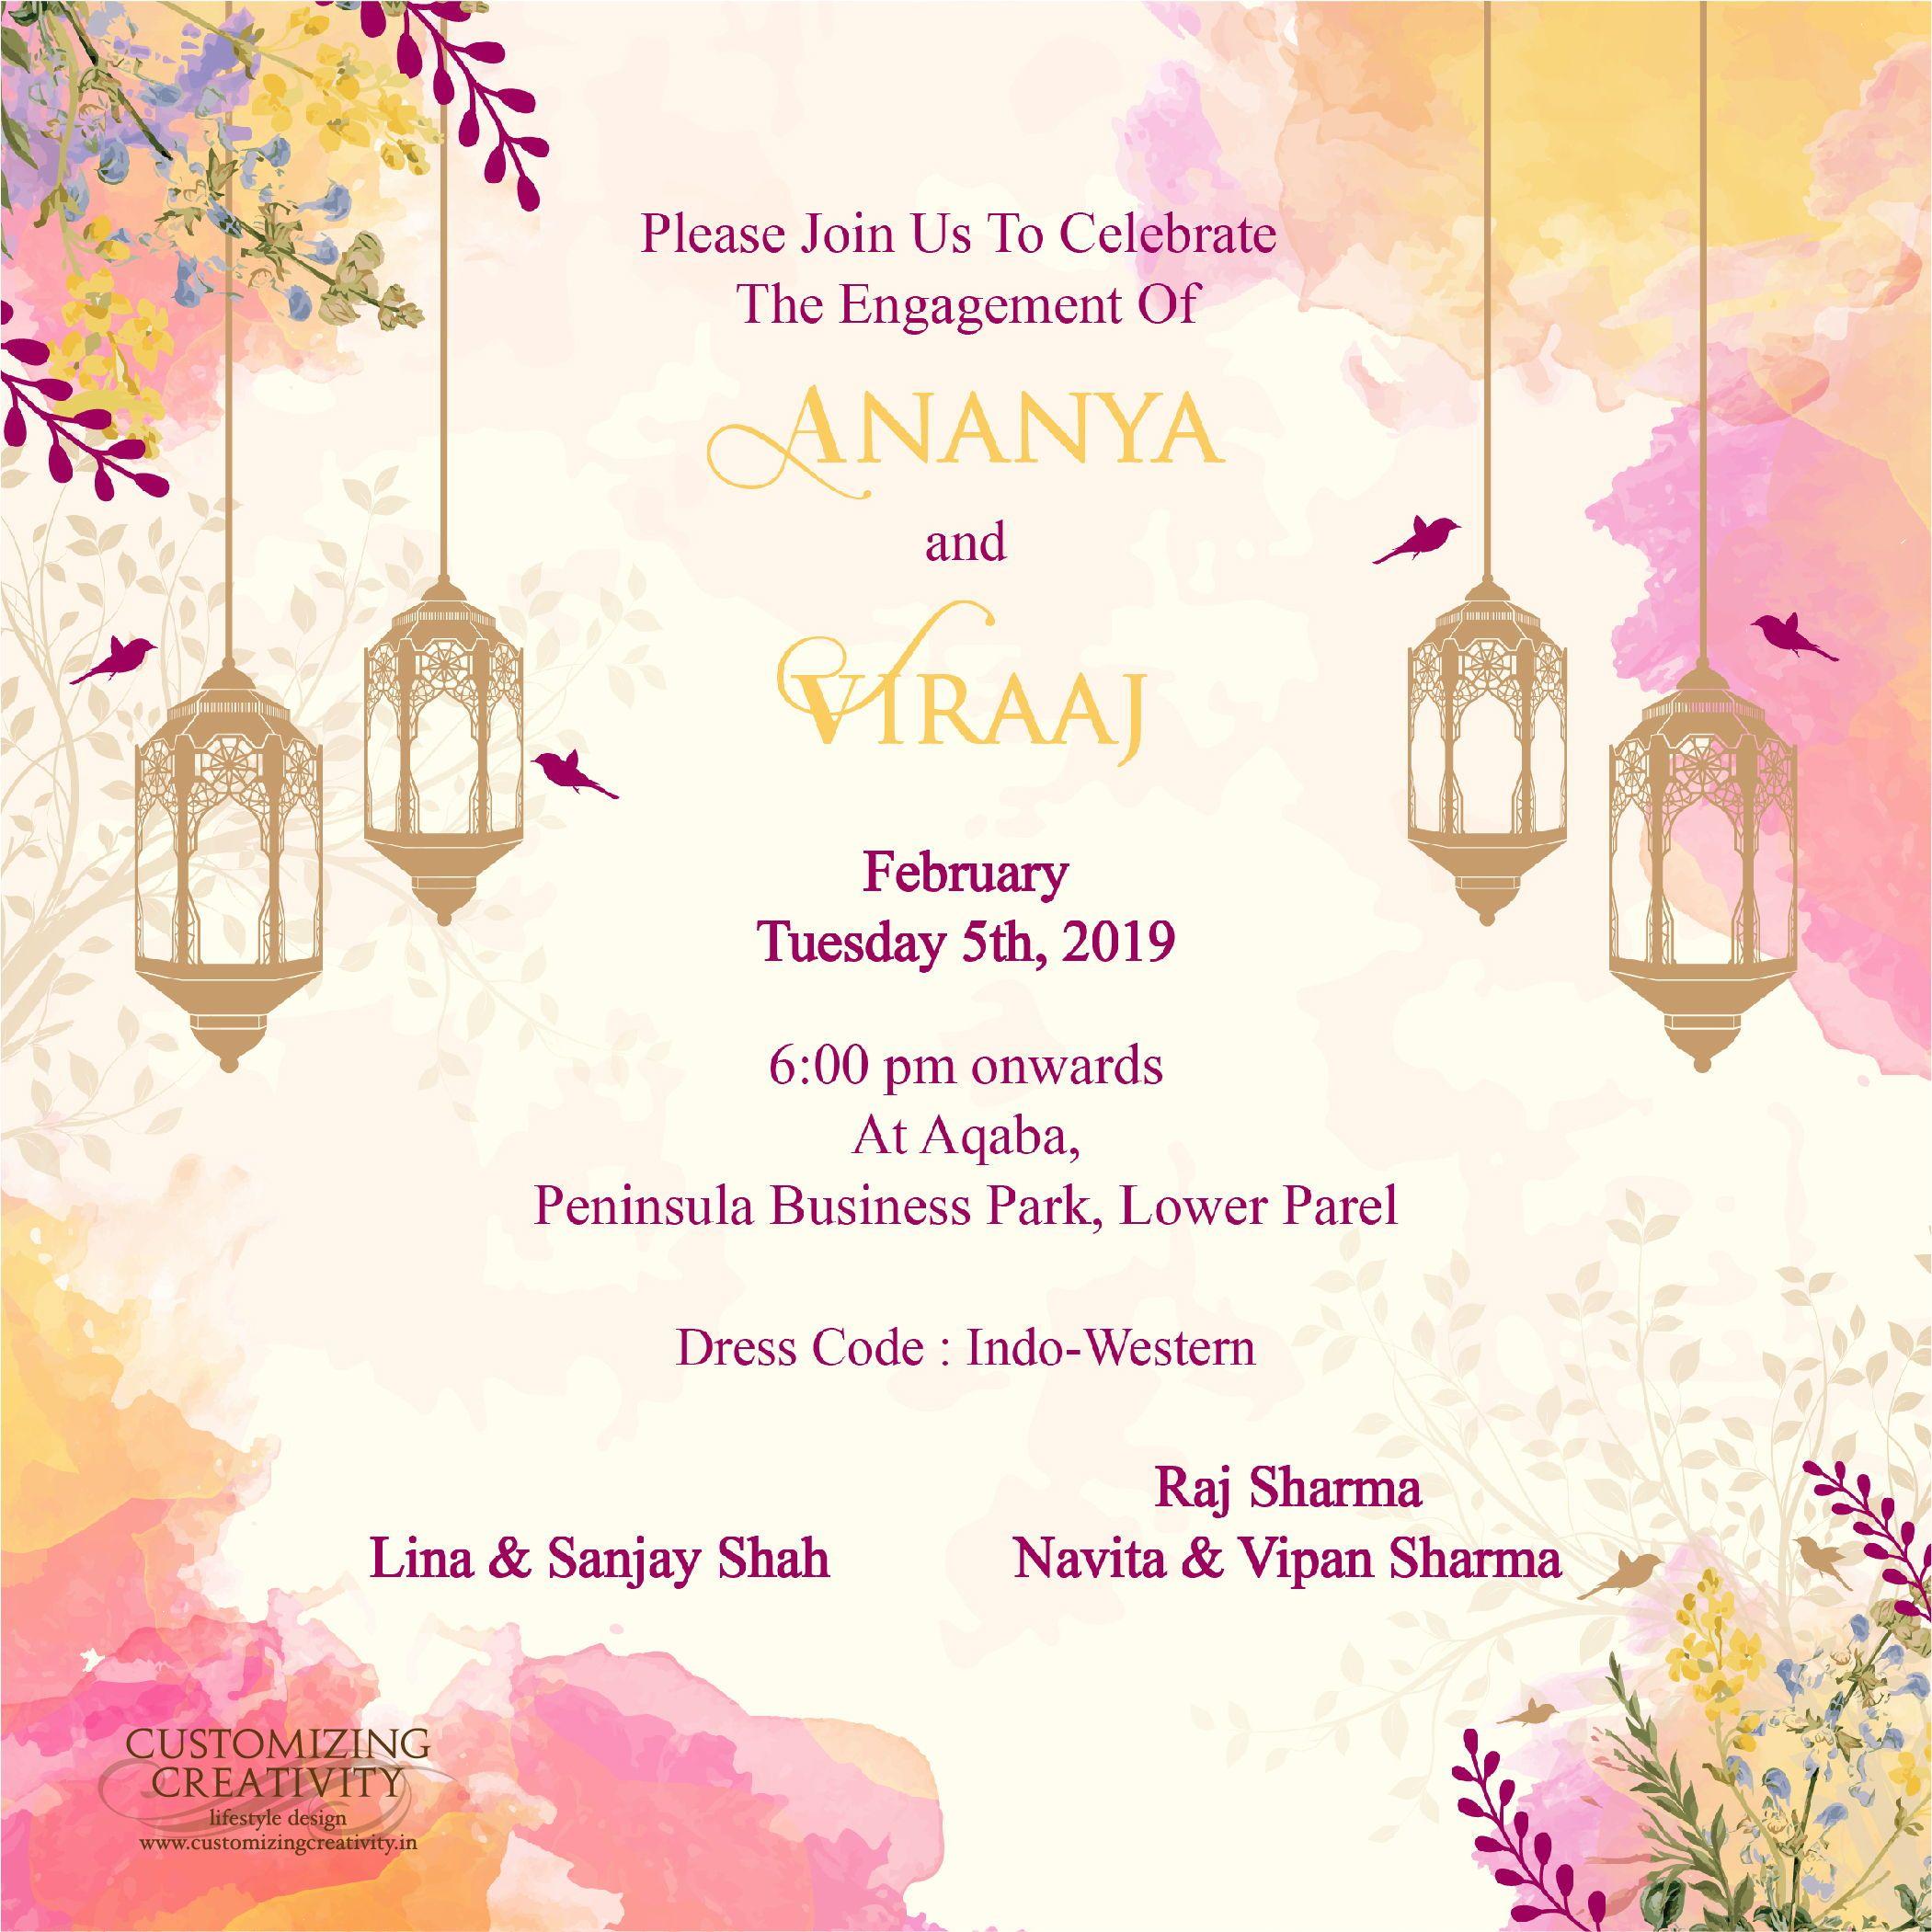 Save The Date Evite Digital Invite Wedding Invite In 2021 Simple Wedding Cards Wedding Invitation Card Design Wedding Cards